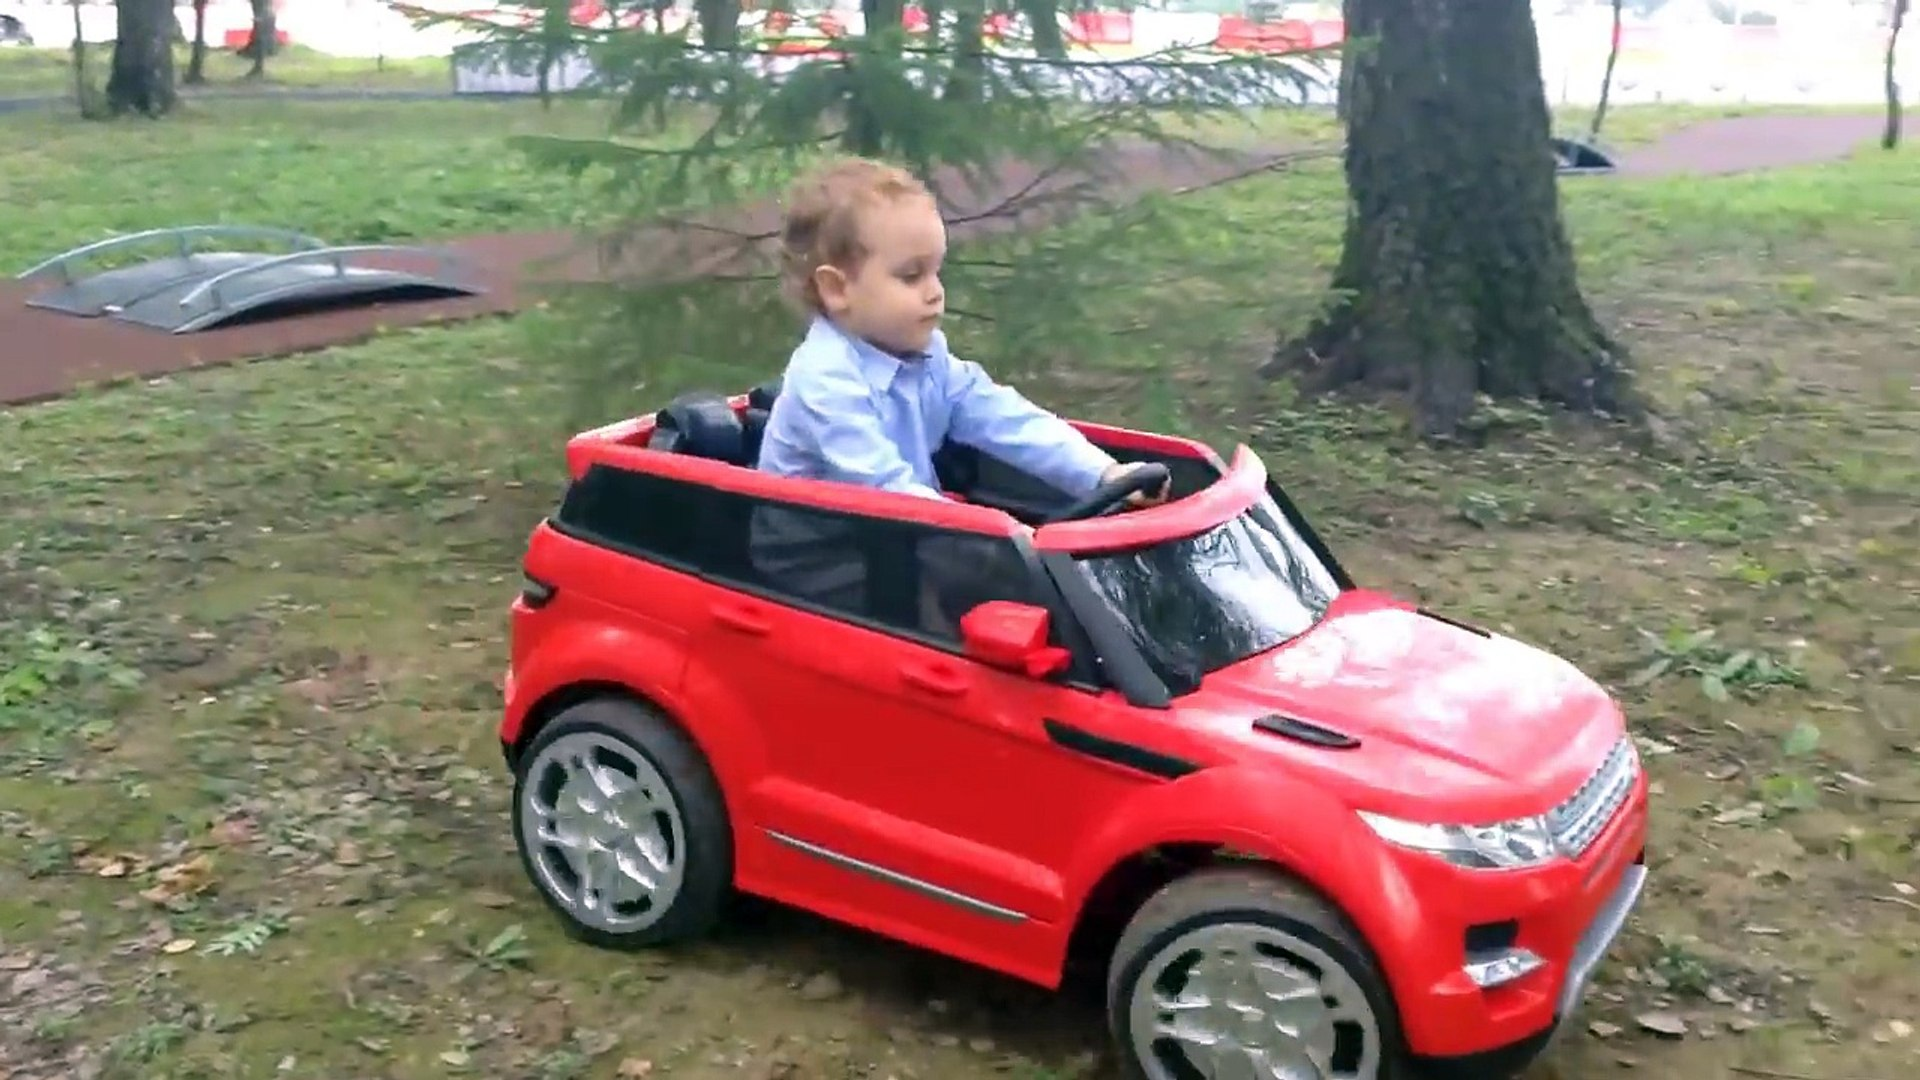 Тимур играет. Видео про машинки для детей. Playing kid. Kids ride on car, toy cars.